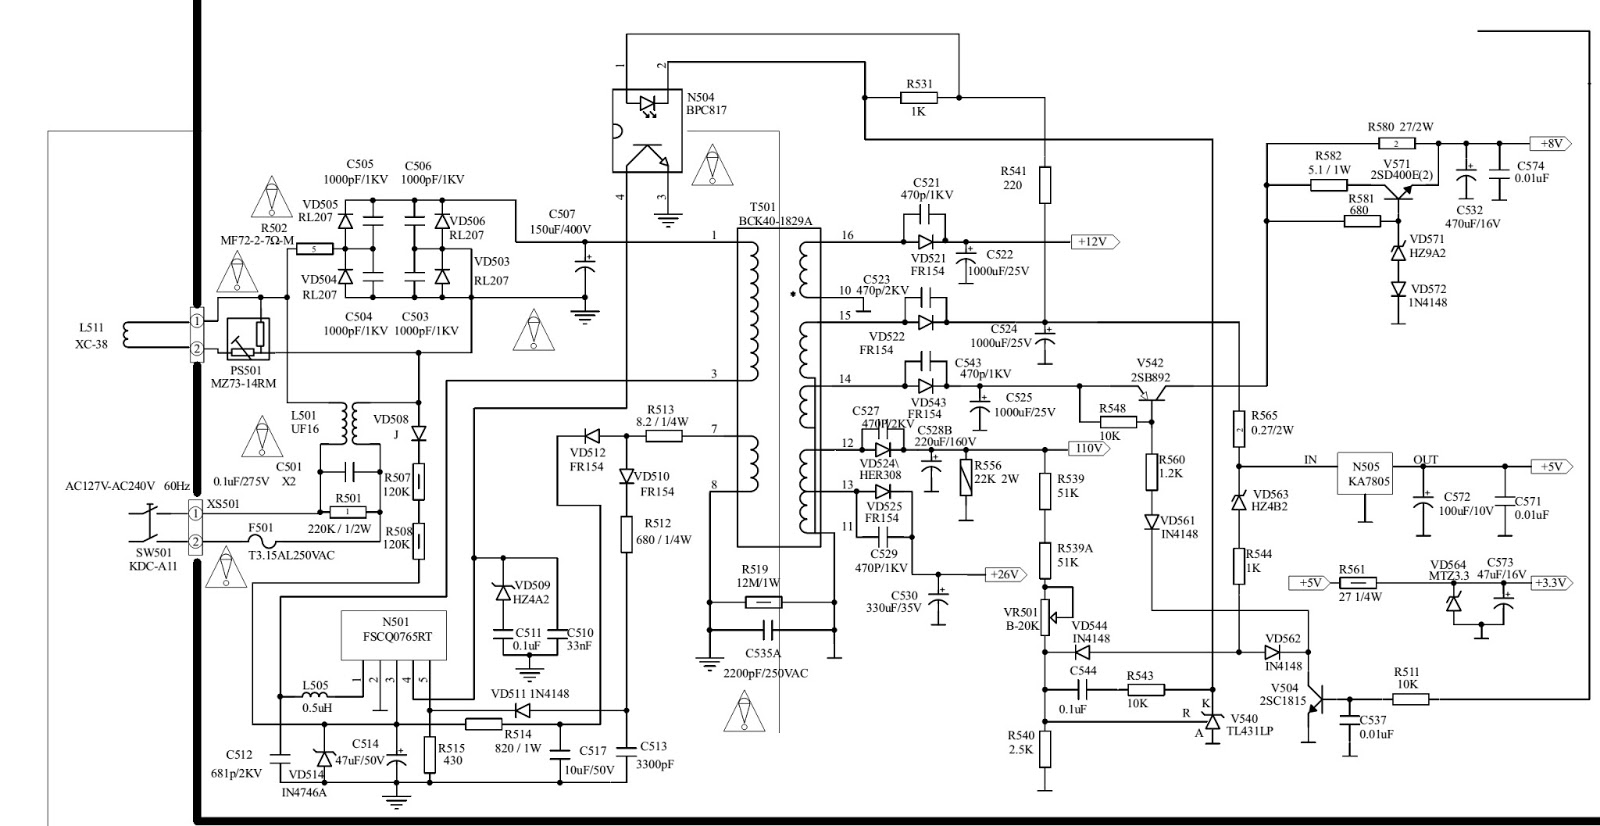 Philco Ph 21 Schematic Diagram Circuit Used Ics Str Of Click On Schematics To Zoom In